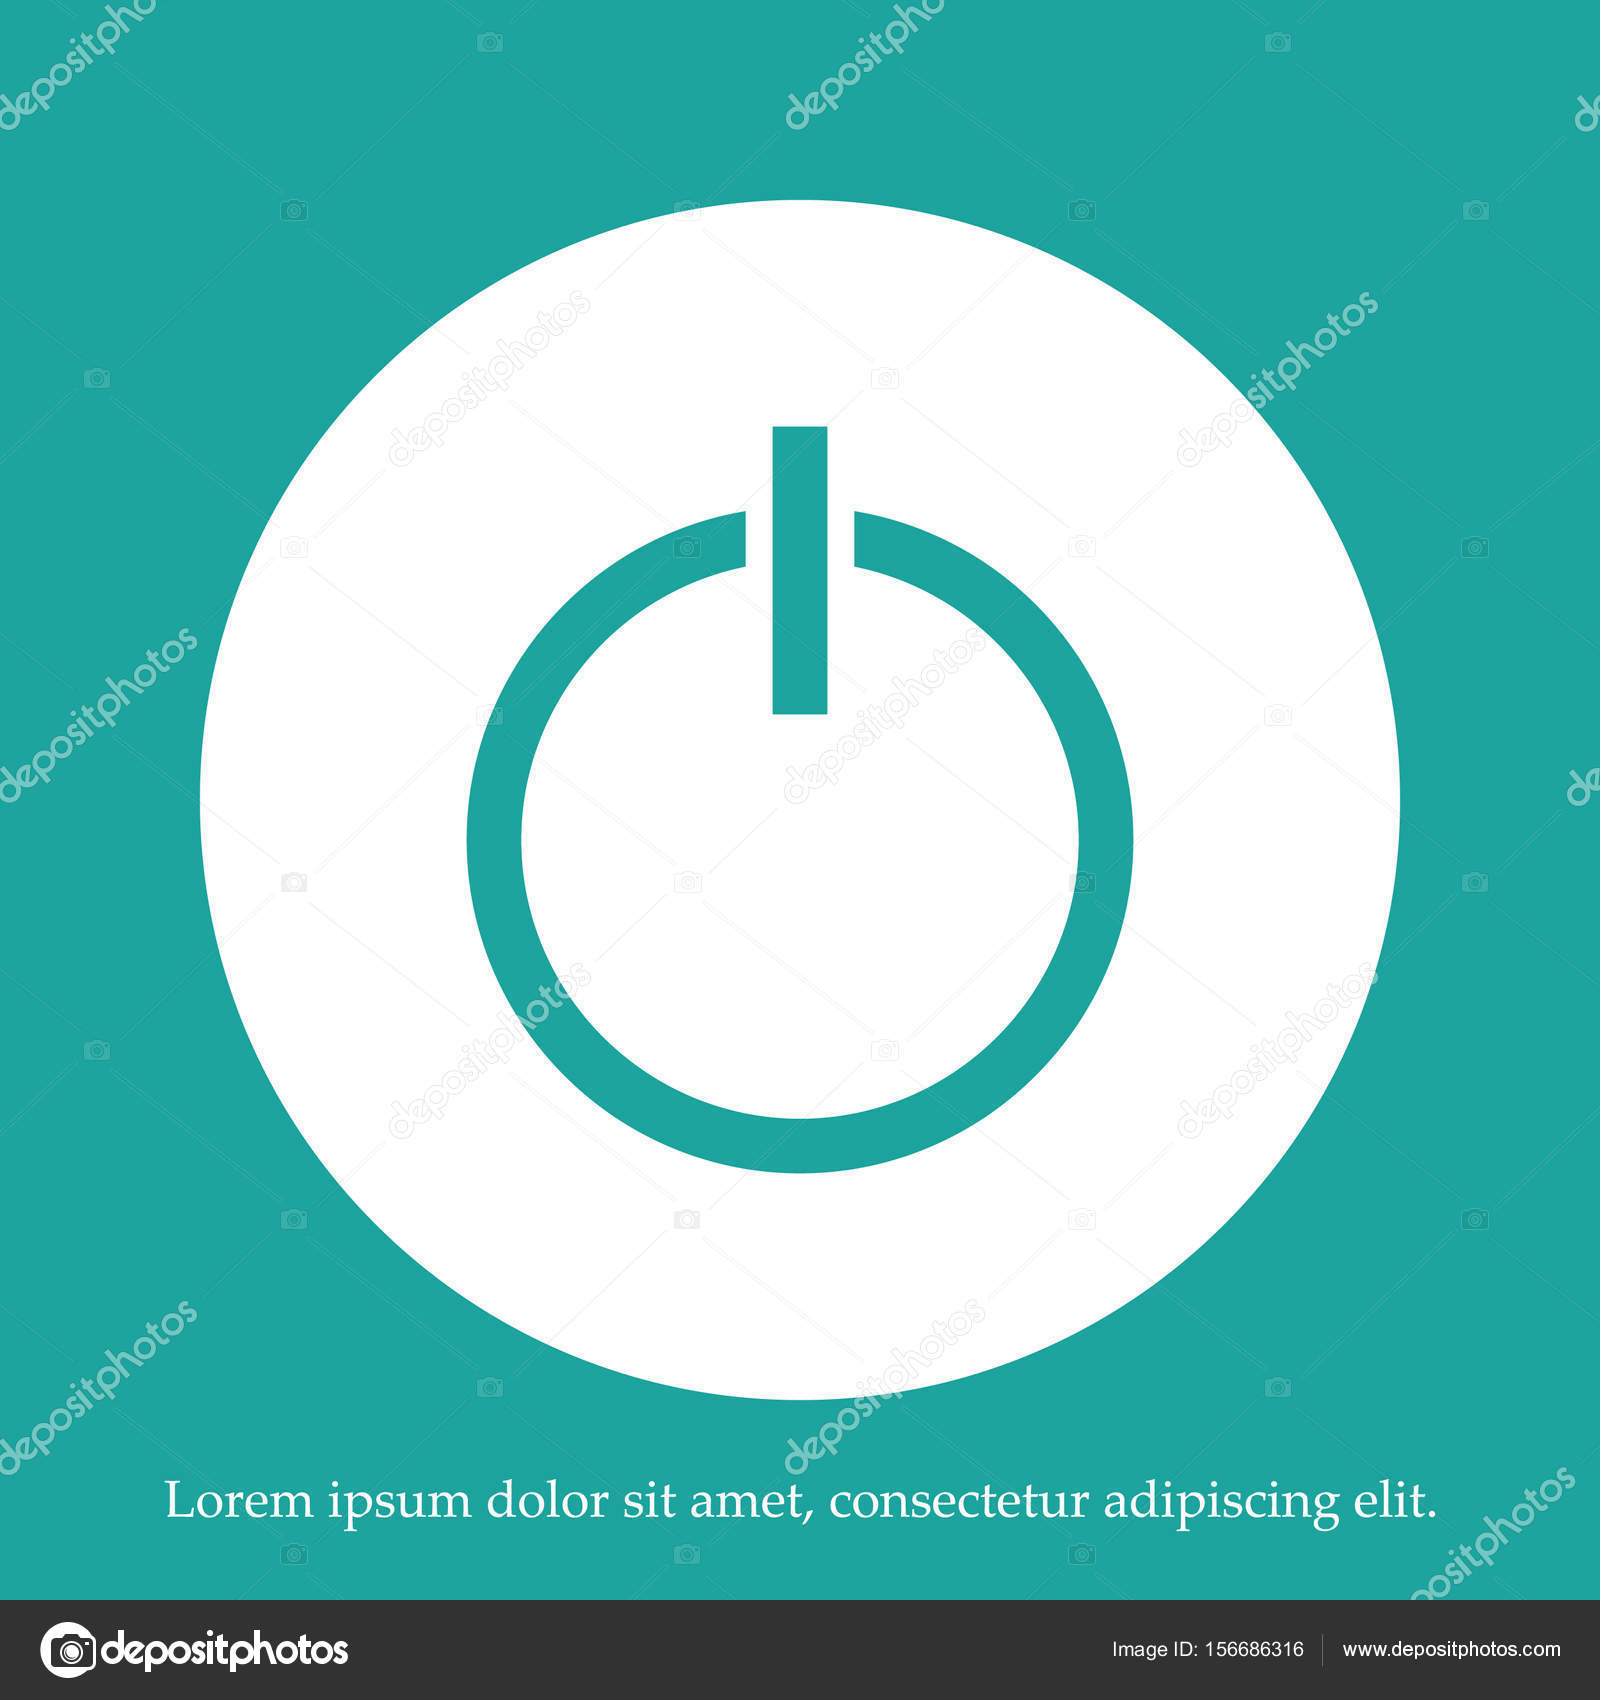 Symbol zu wechseln, Vektor — Stockvektor © Flat.Icon #156686316